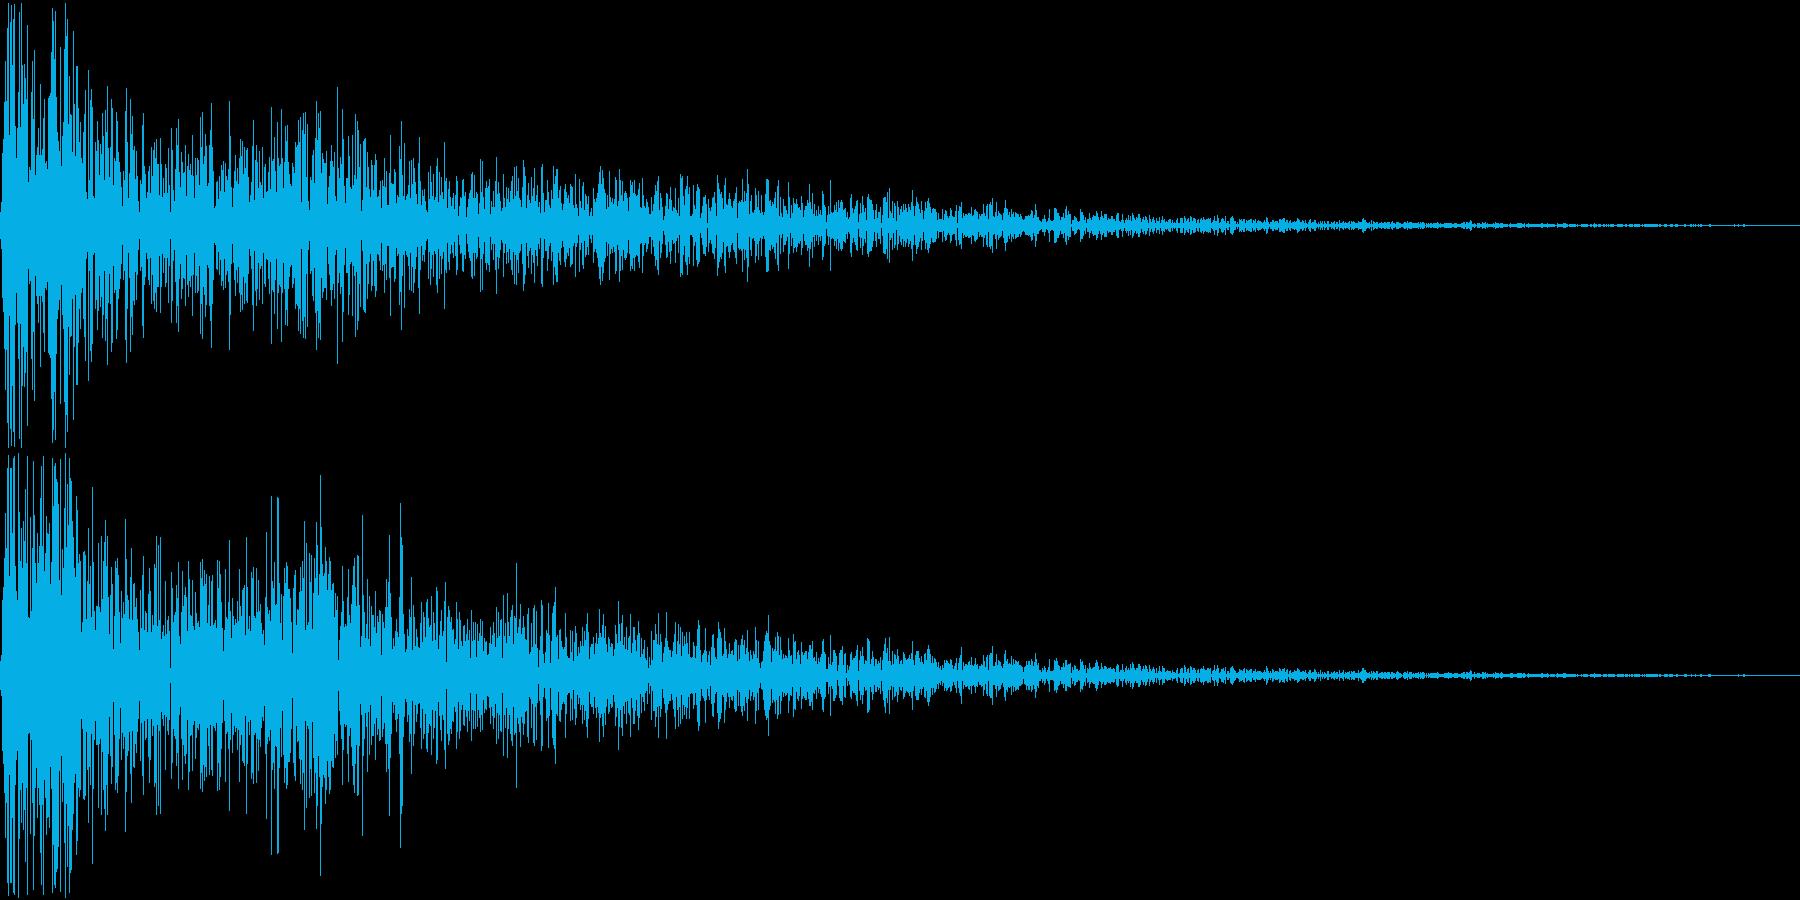 DTM Snare 9 オリジナル音源の再生済みの波形